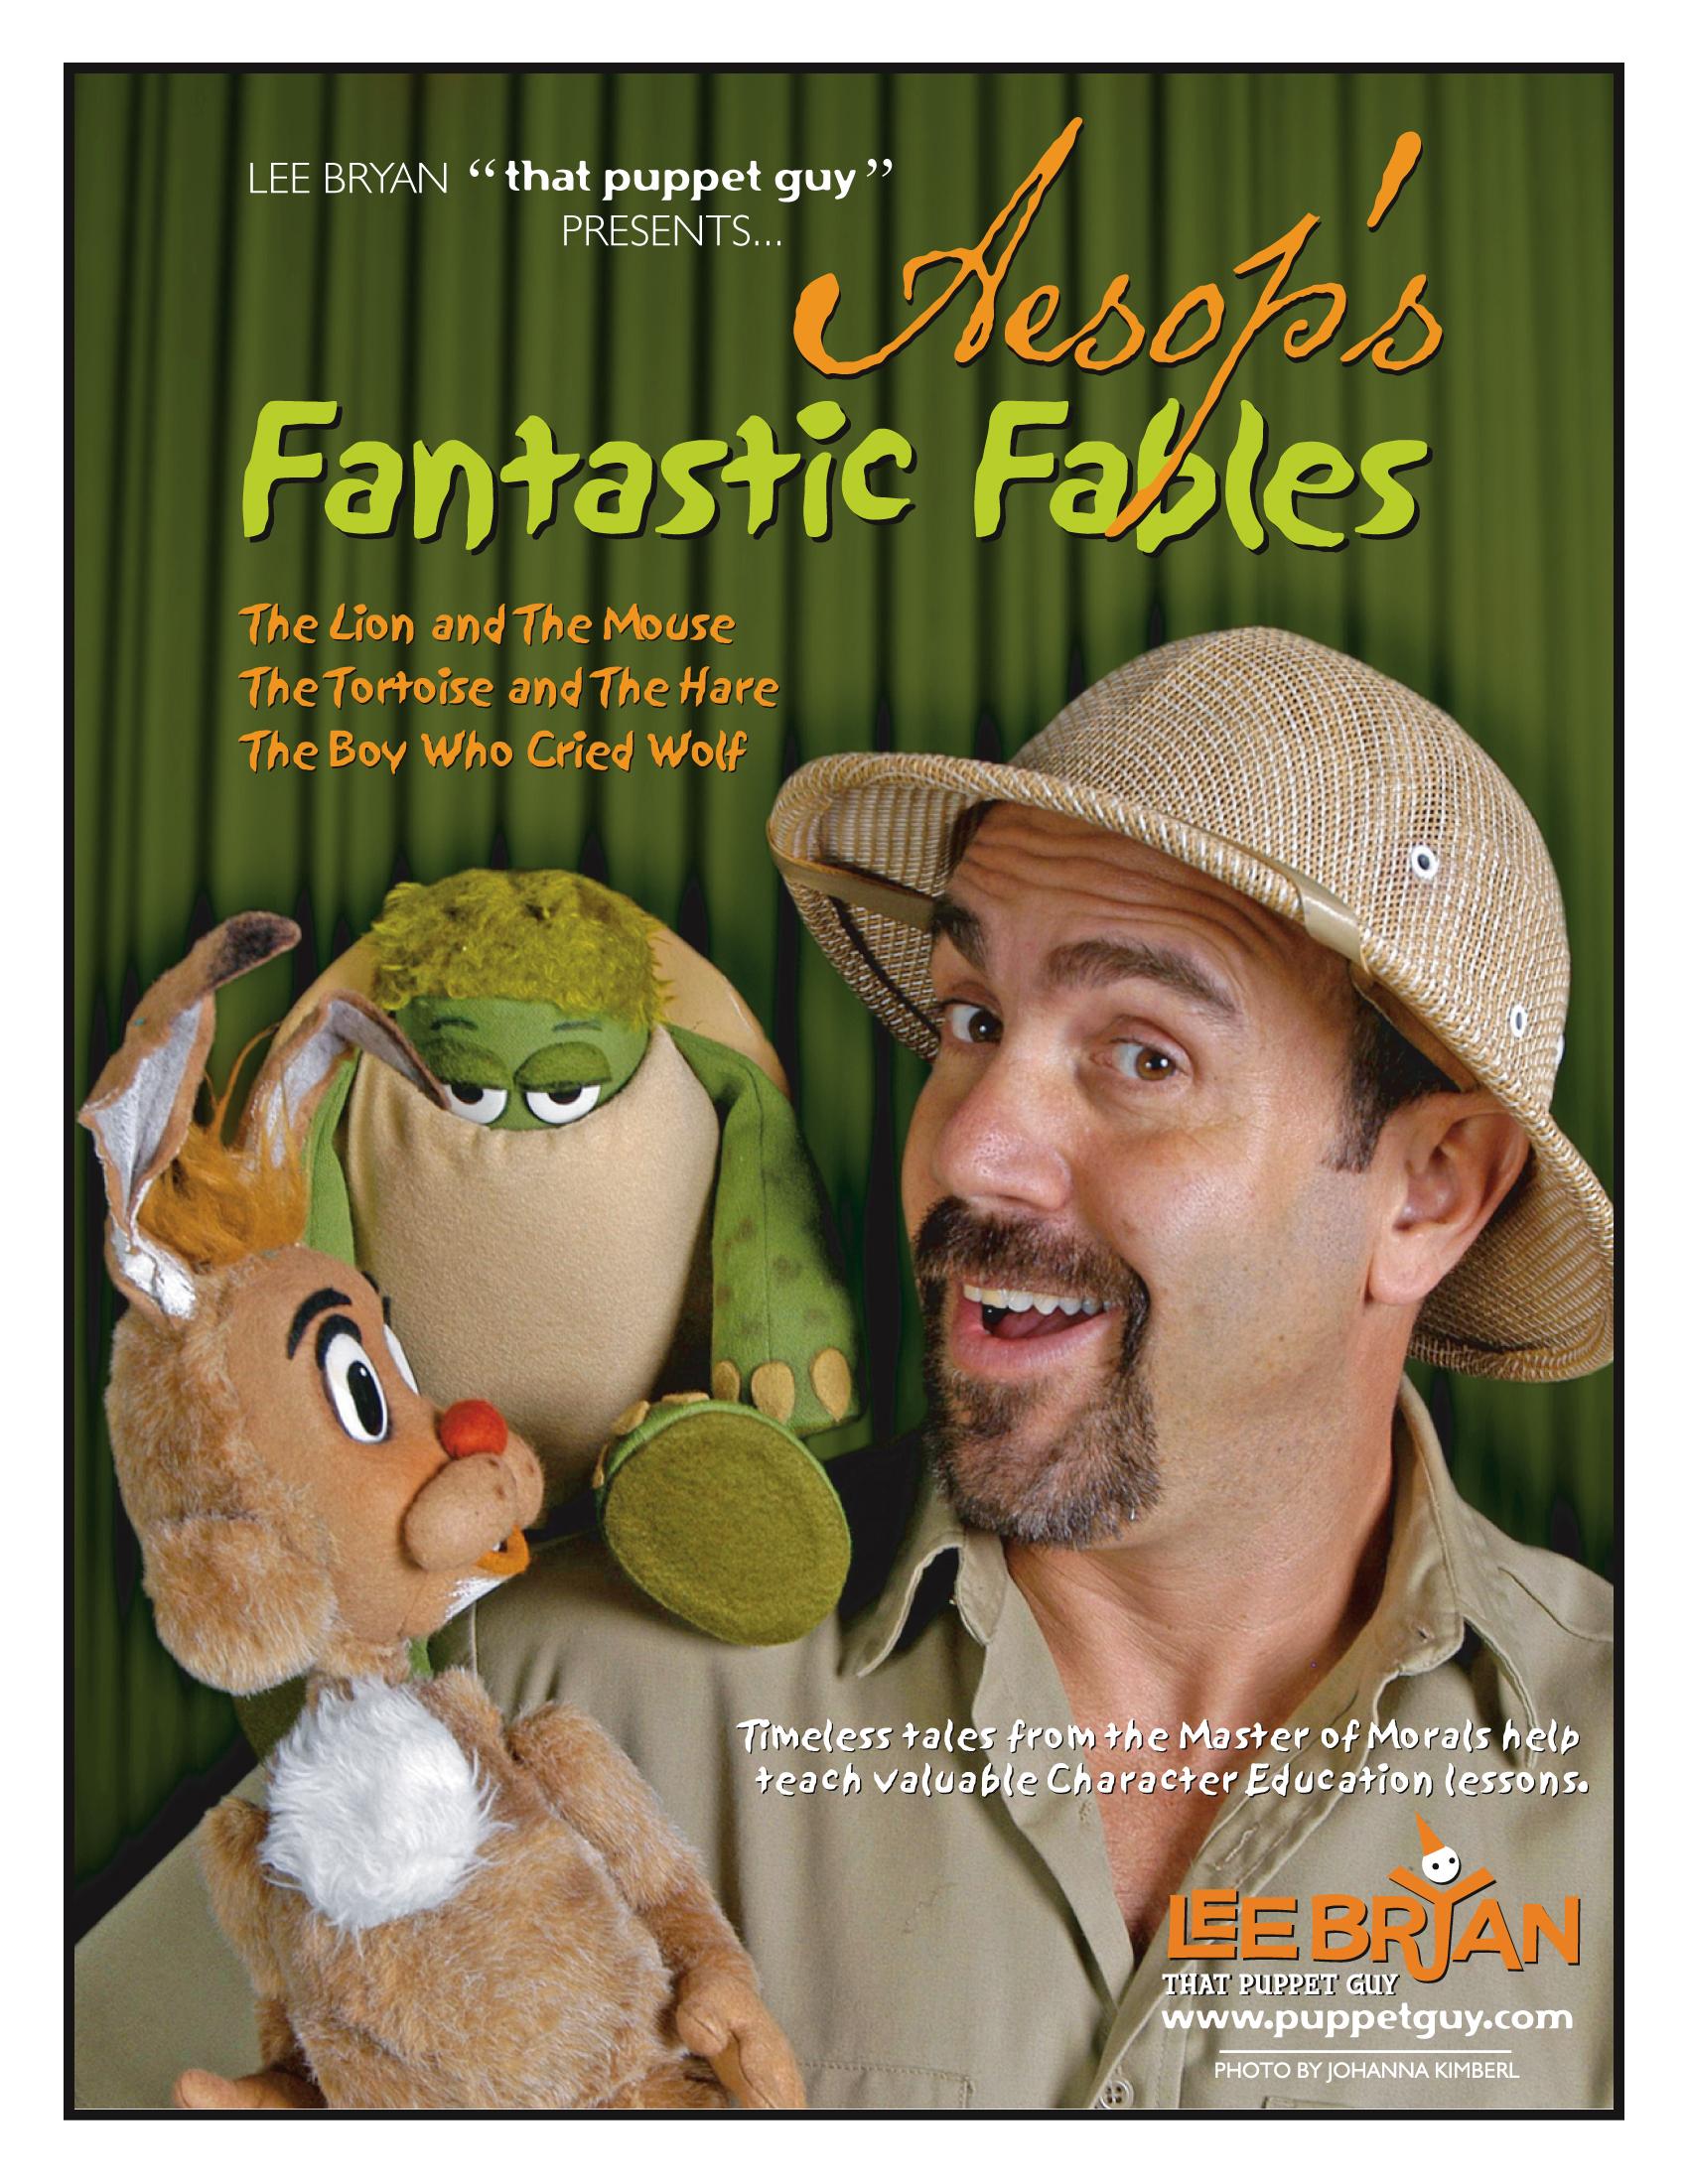 Publicity Slick Aesop's Fantastic Fables